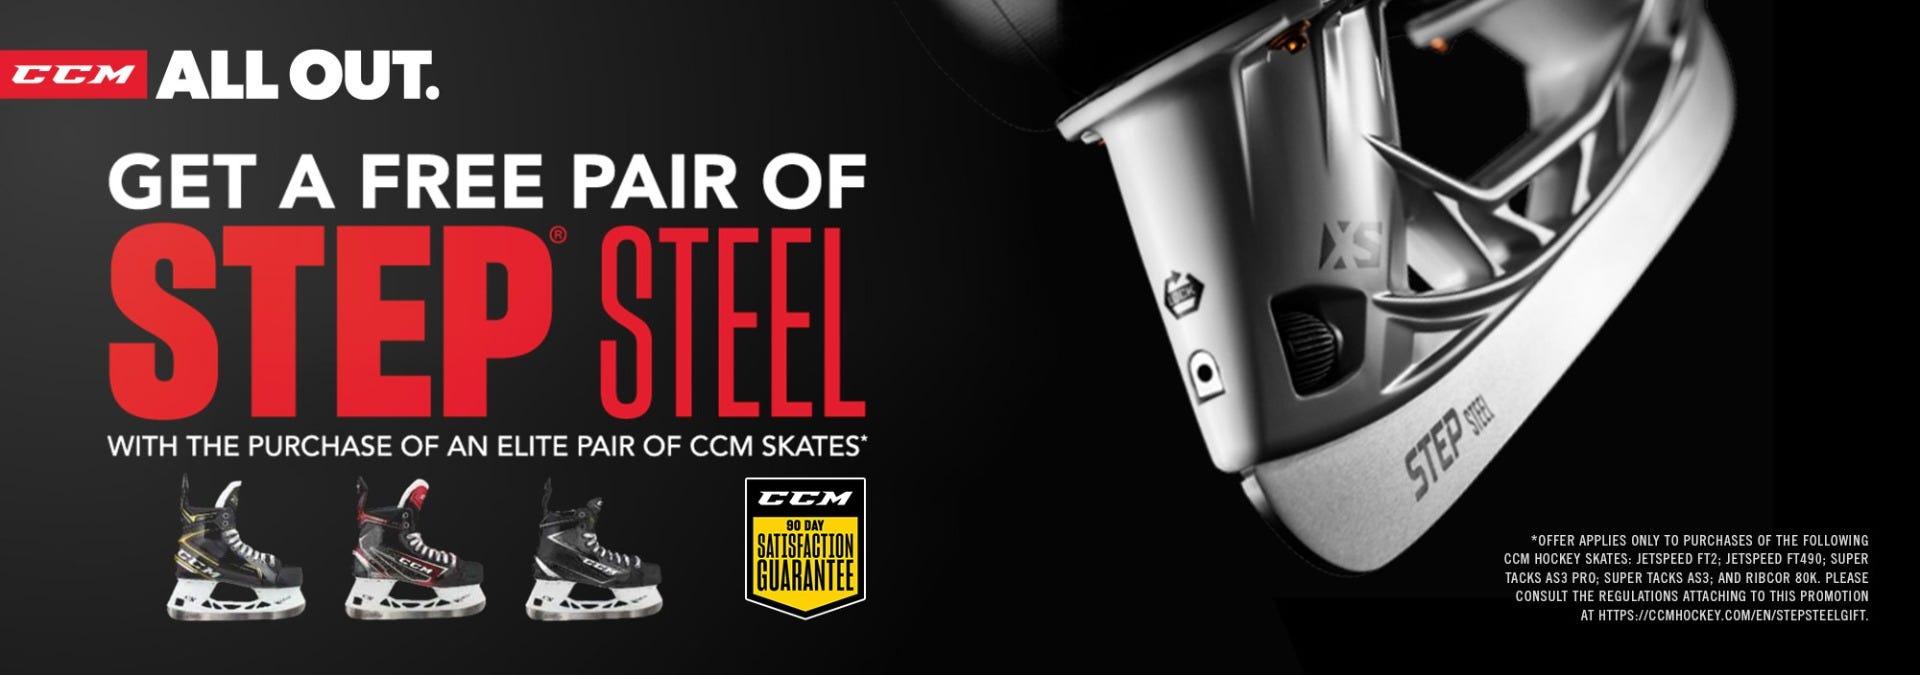 Free Step Steel with CCM Premier Skates